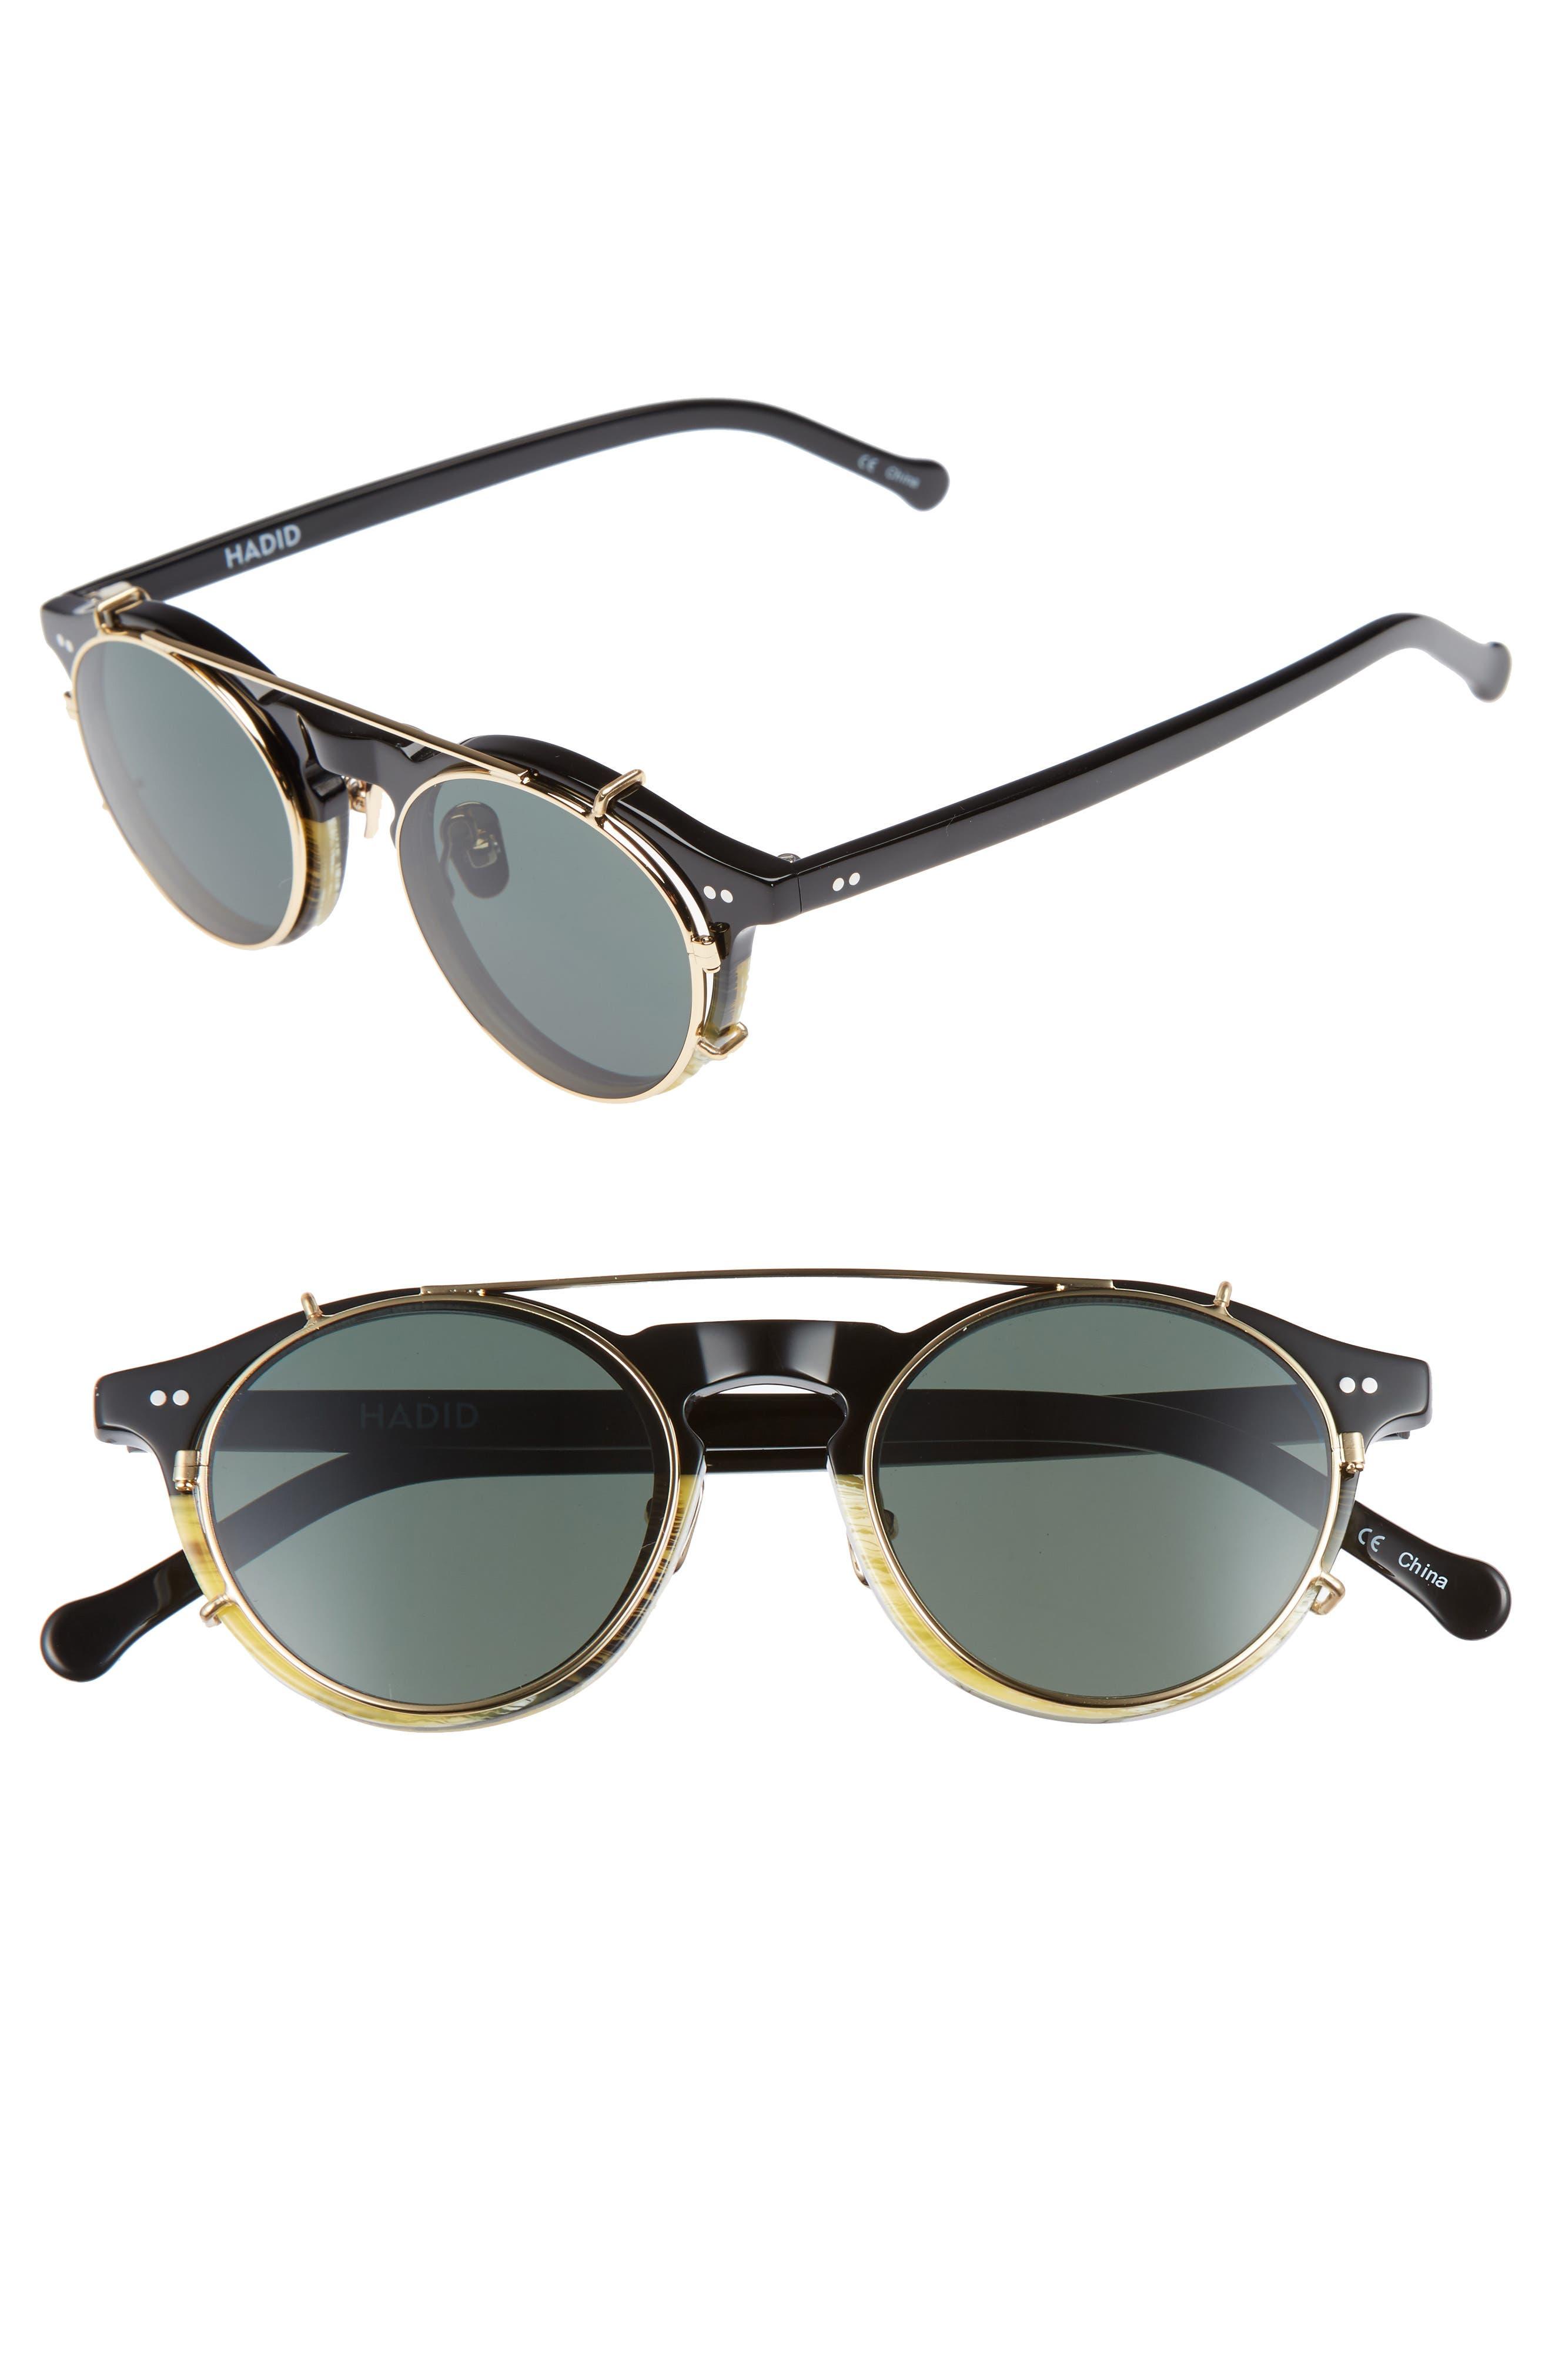 HADID Captain 46mm Clip-On Sunglasses